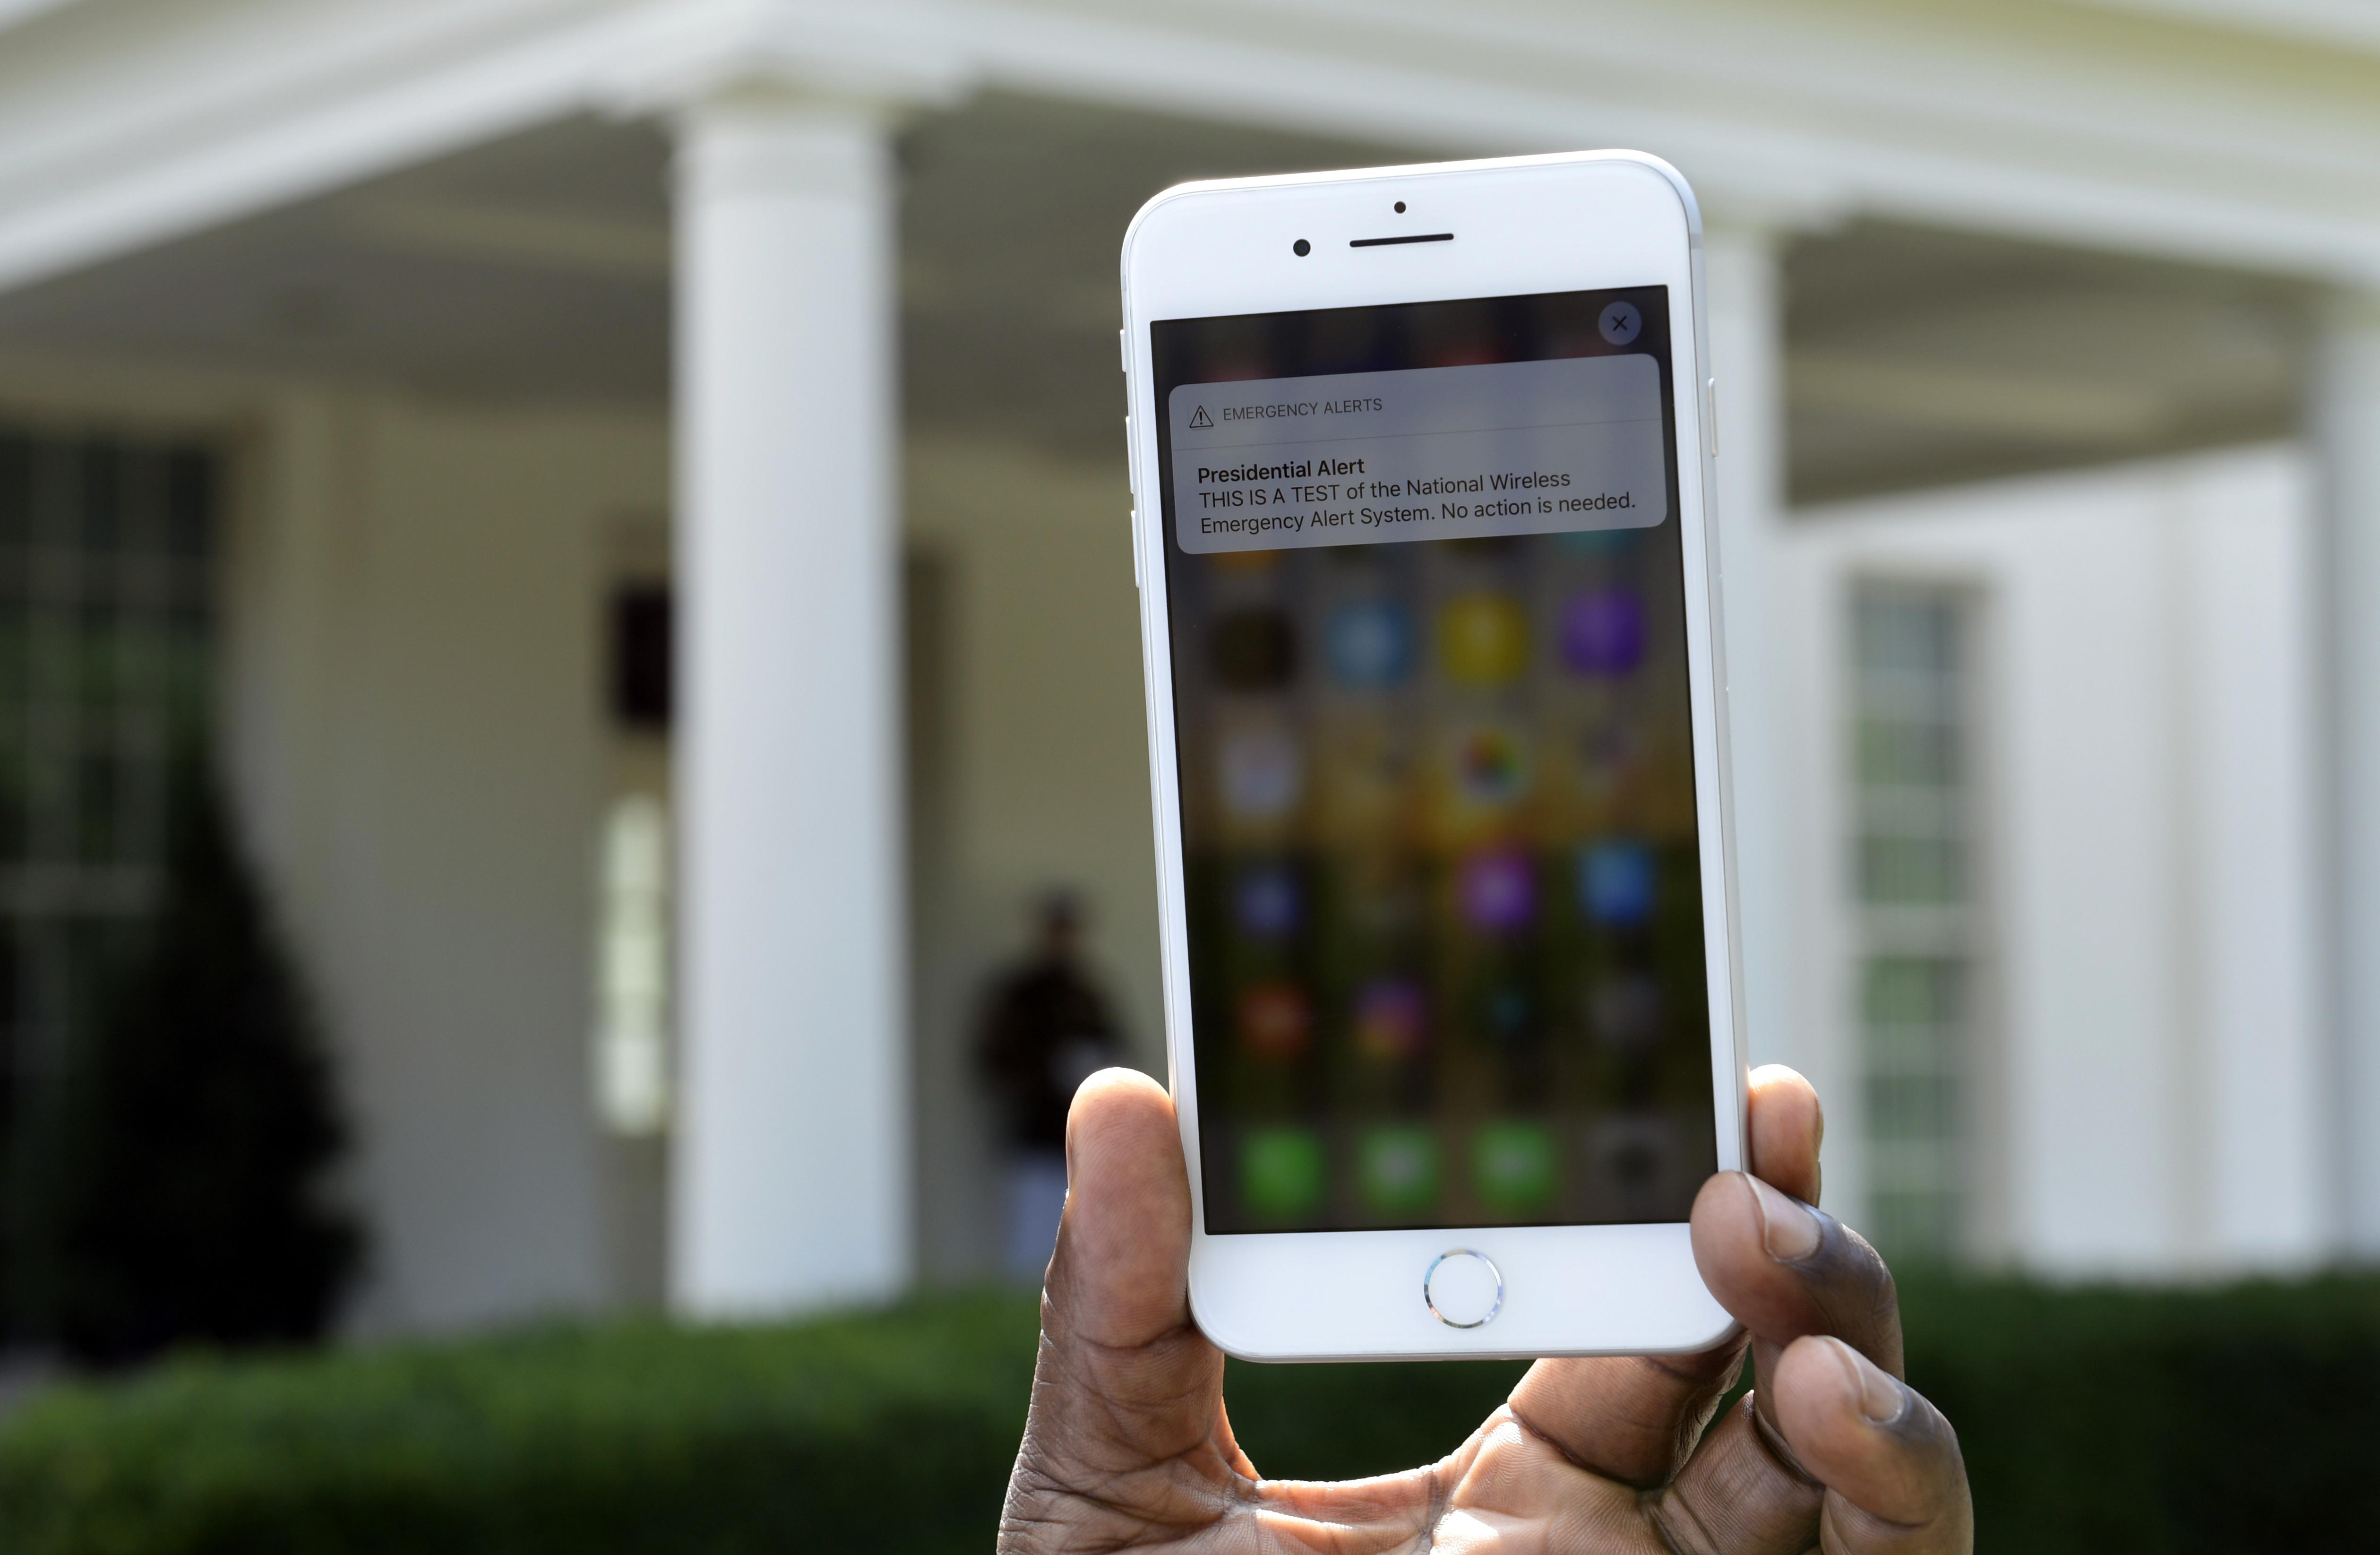 Not everyone got the 'Presidential Alert'